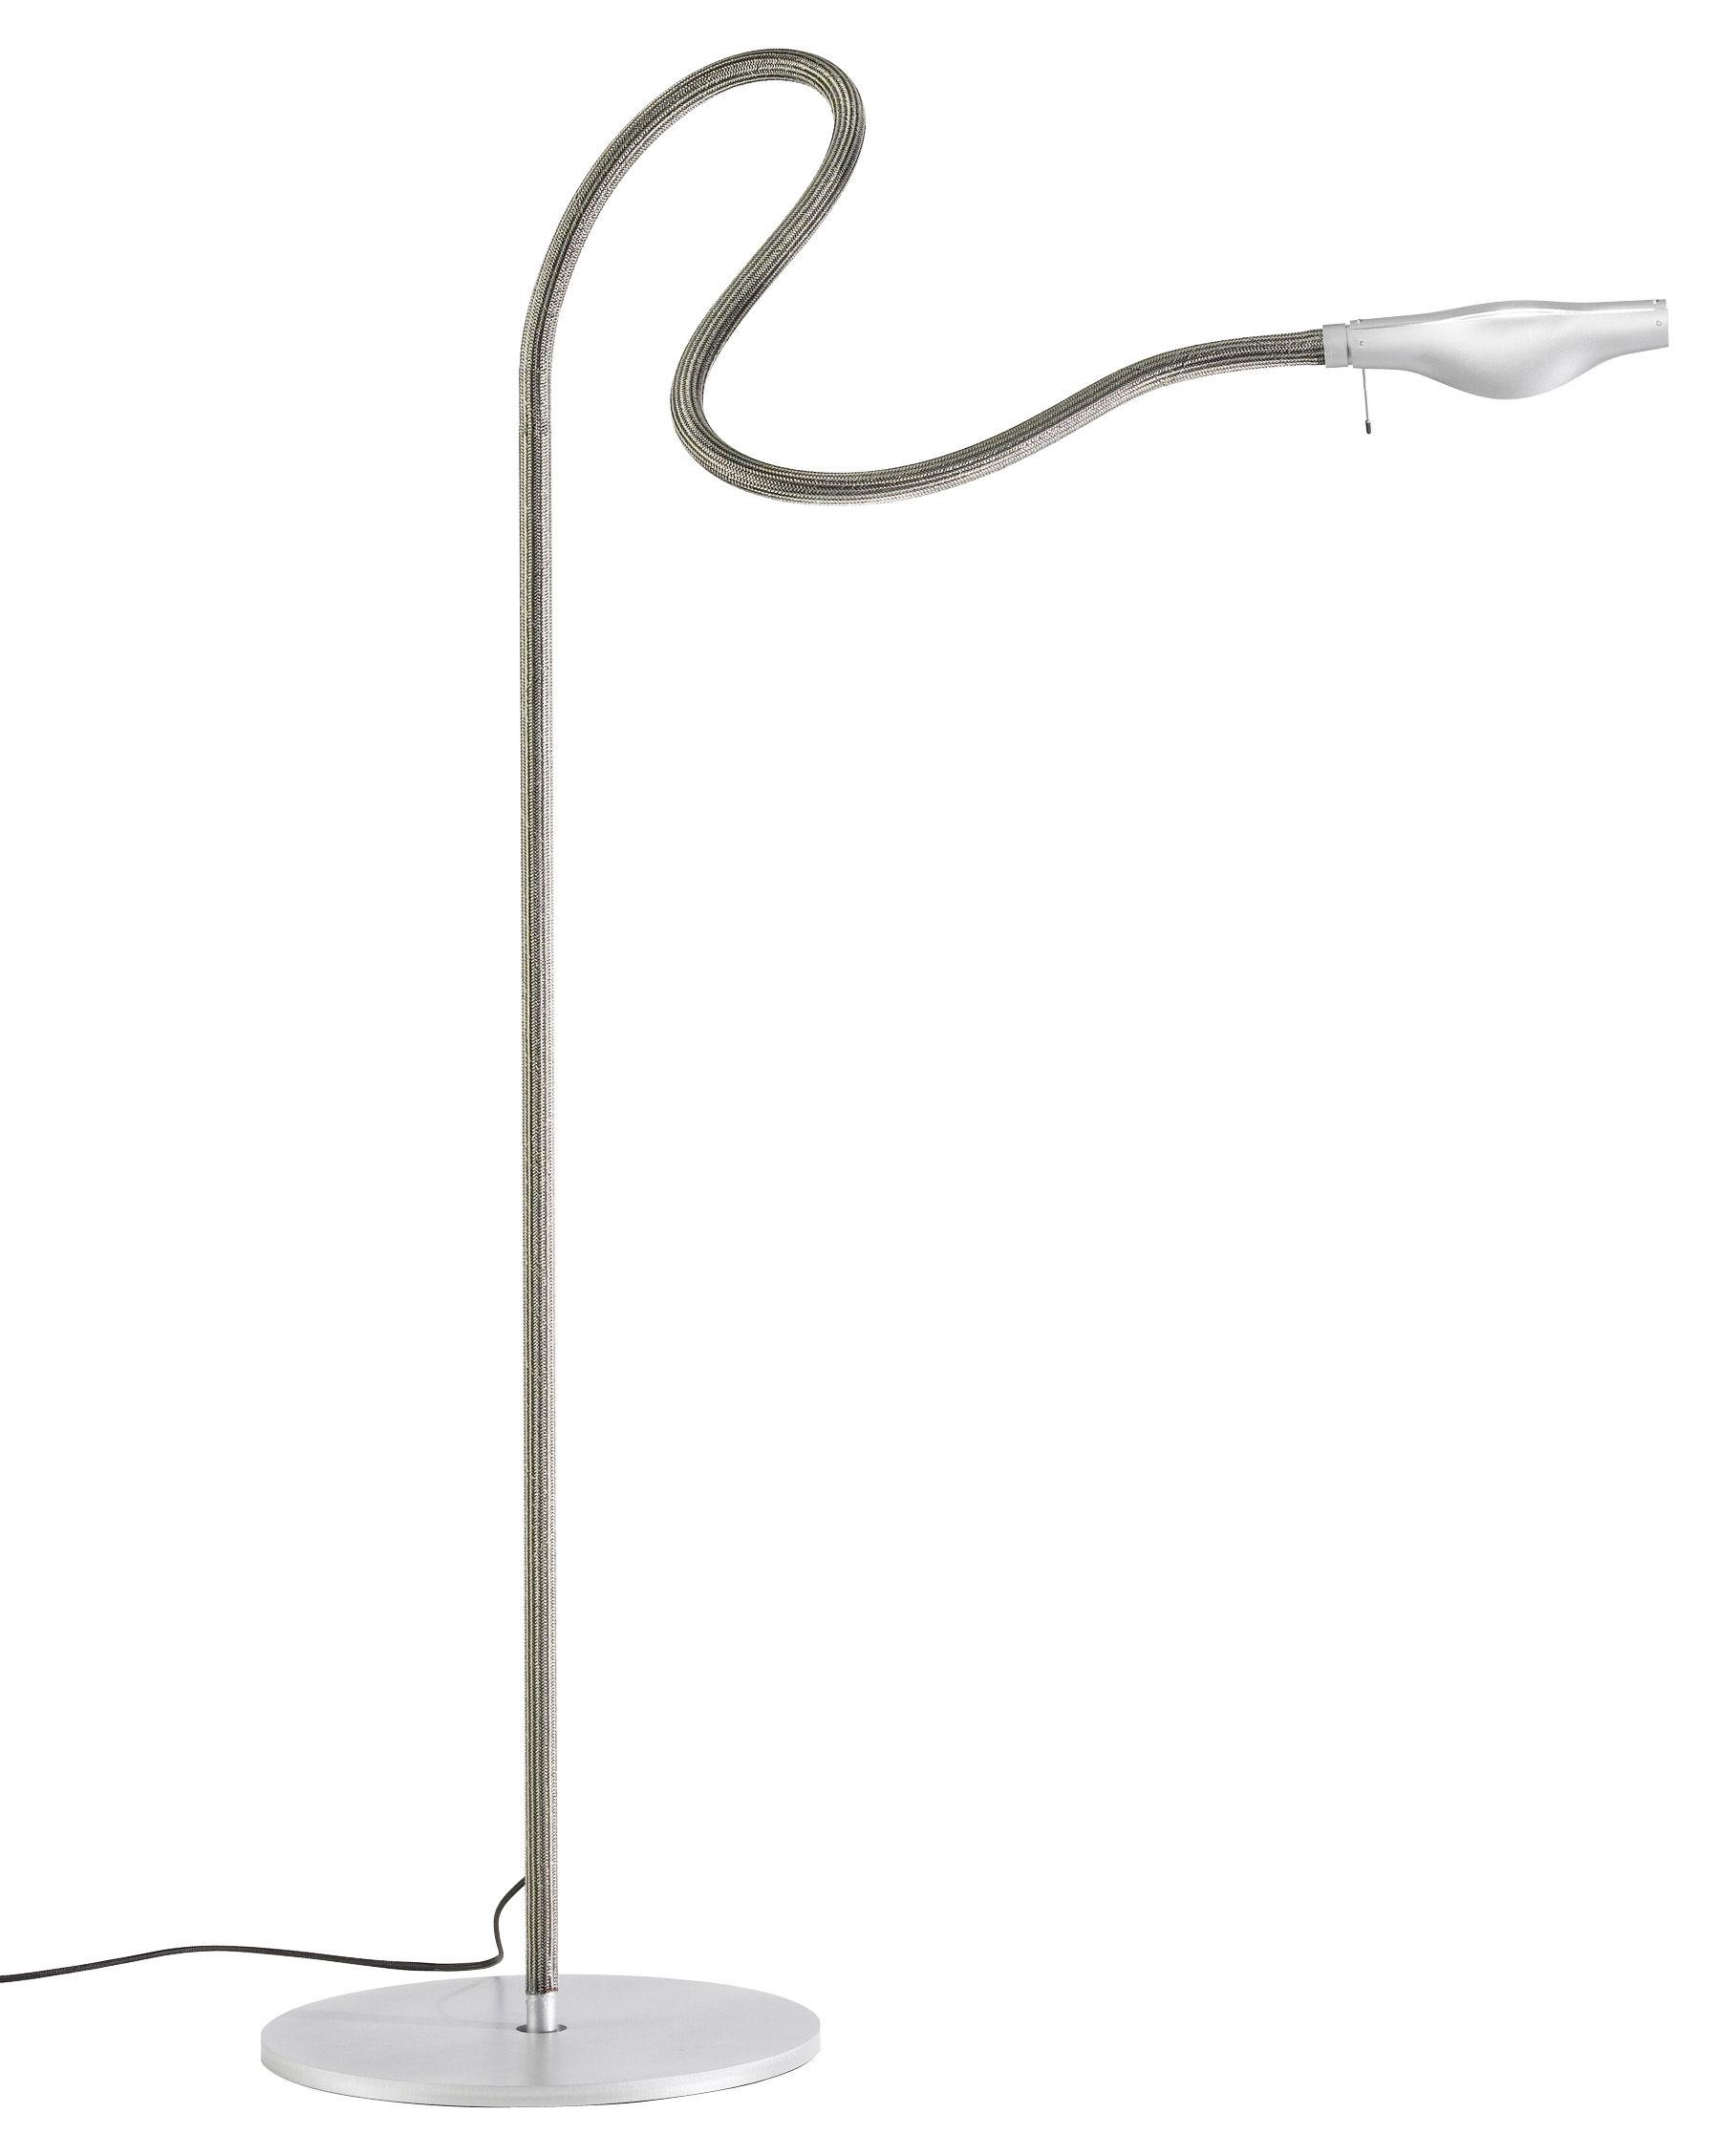 Luminaire - Lampadaires - Lampadaire Metall F. Cooper - Ingo Maurer - Gris - Caoutchouc, Métal